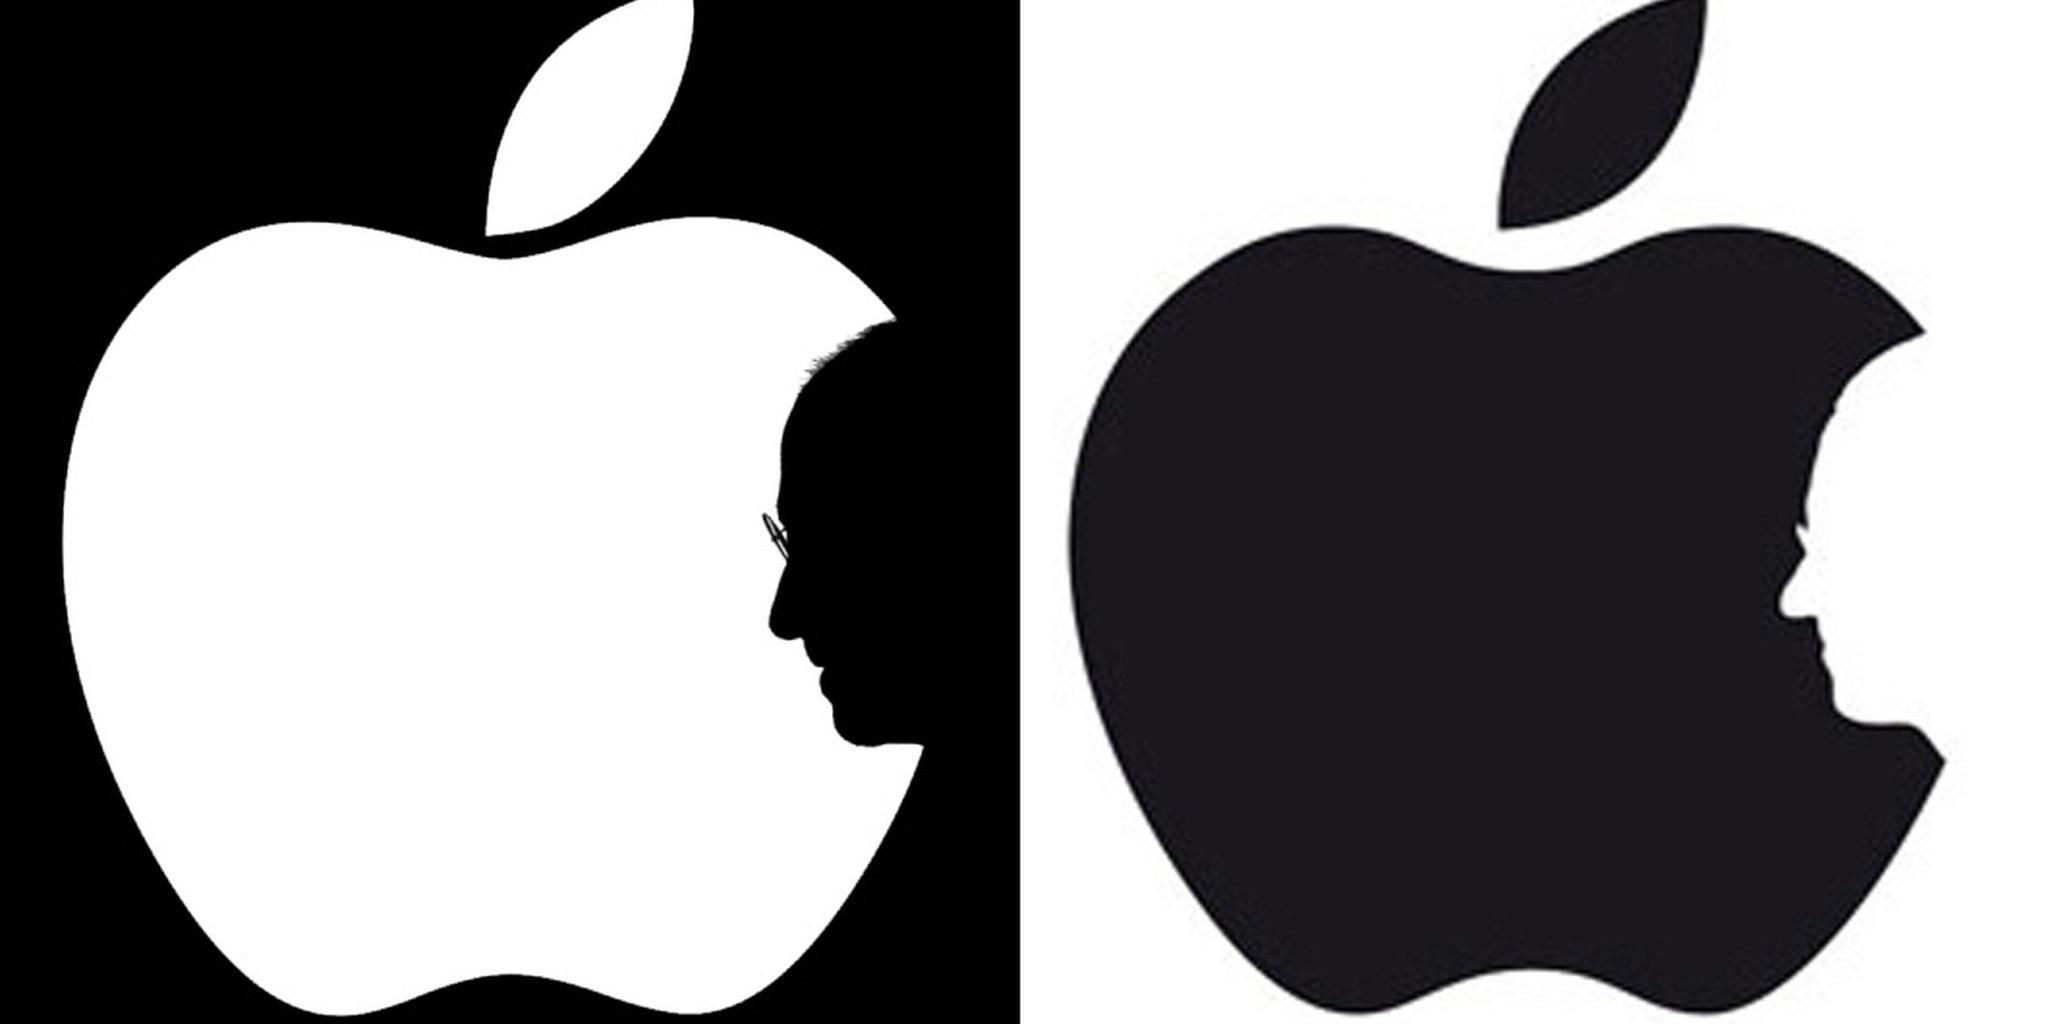 2048x1024 Two Illustrators Claim Credit For The Same Steve Jobs Portrait